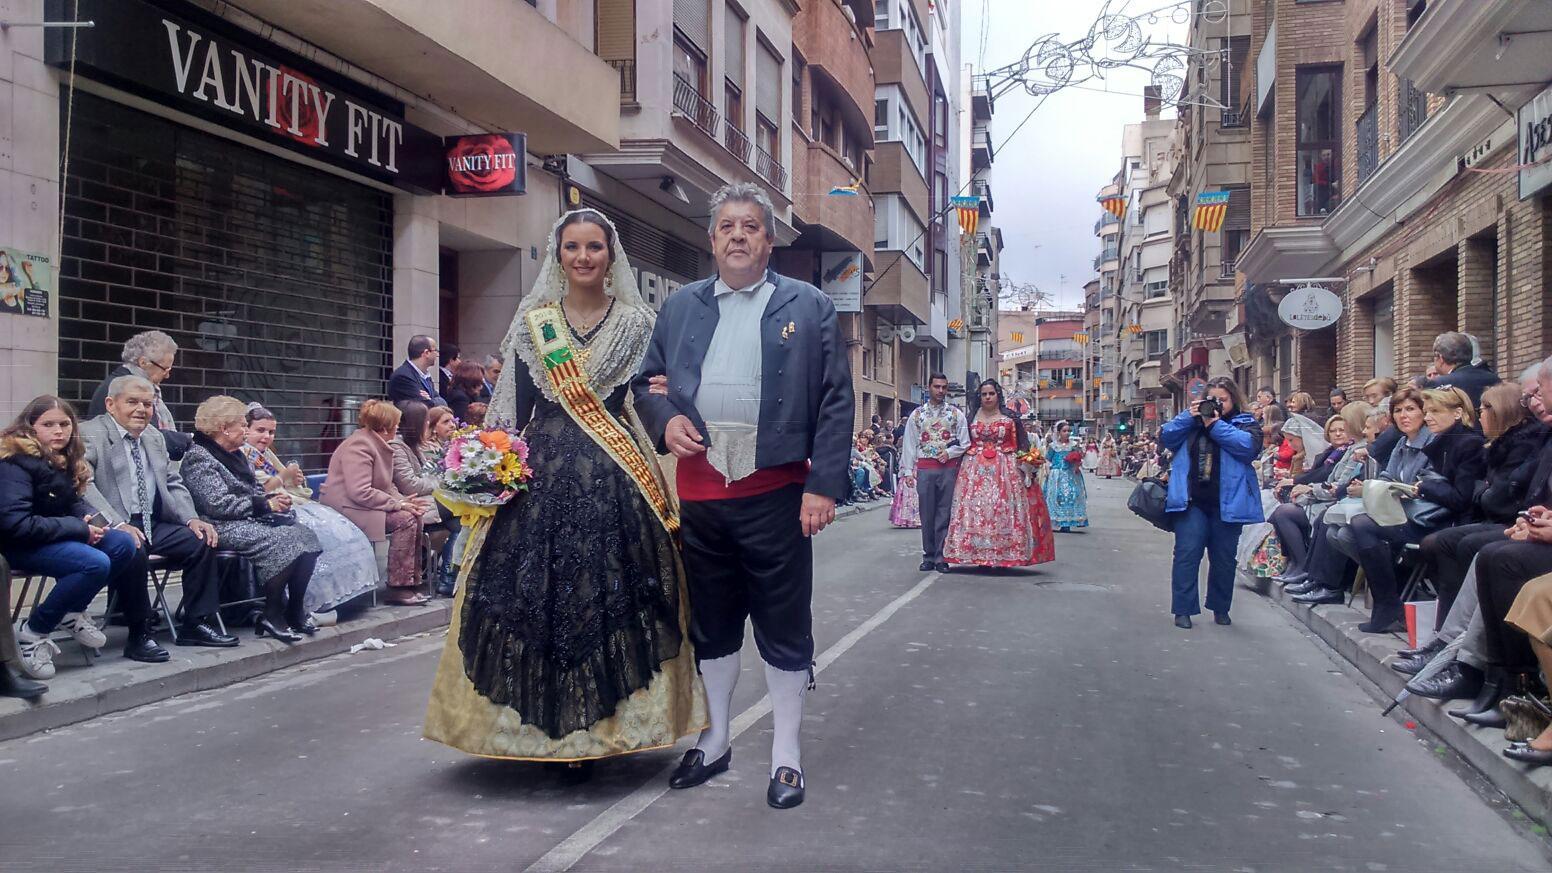 160319-ofrenda-crema-burriana-6013